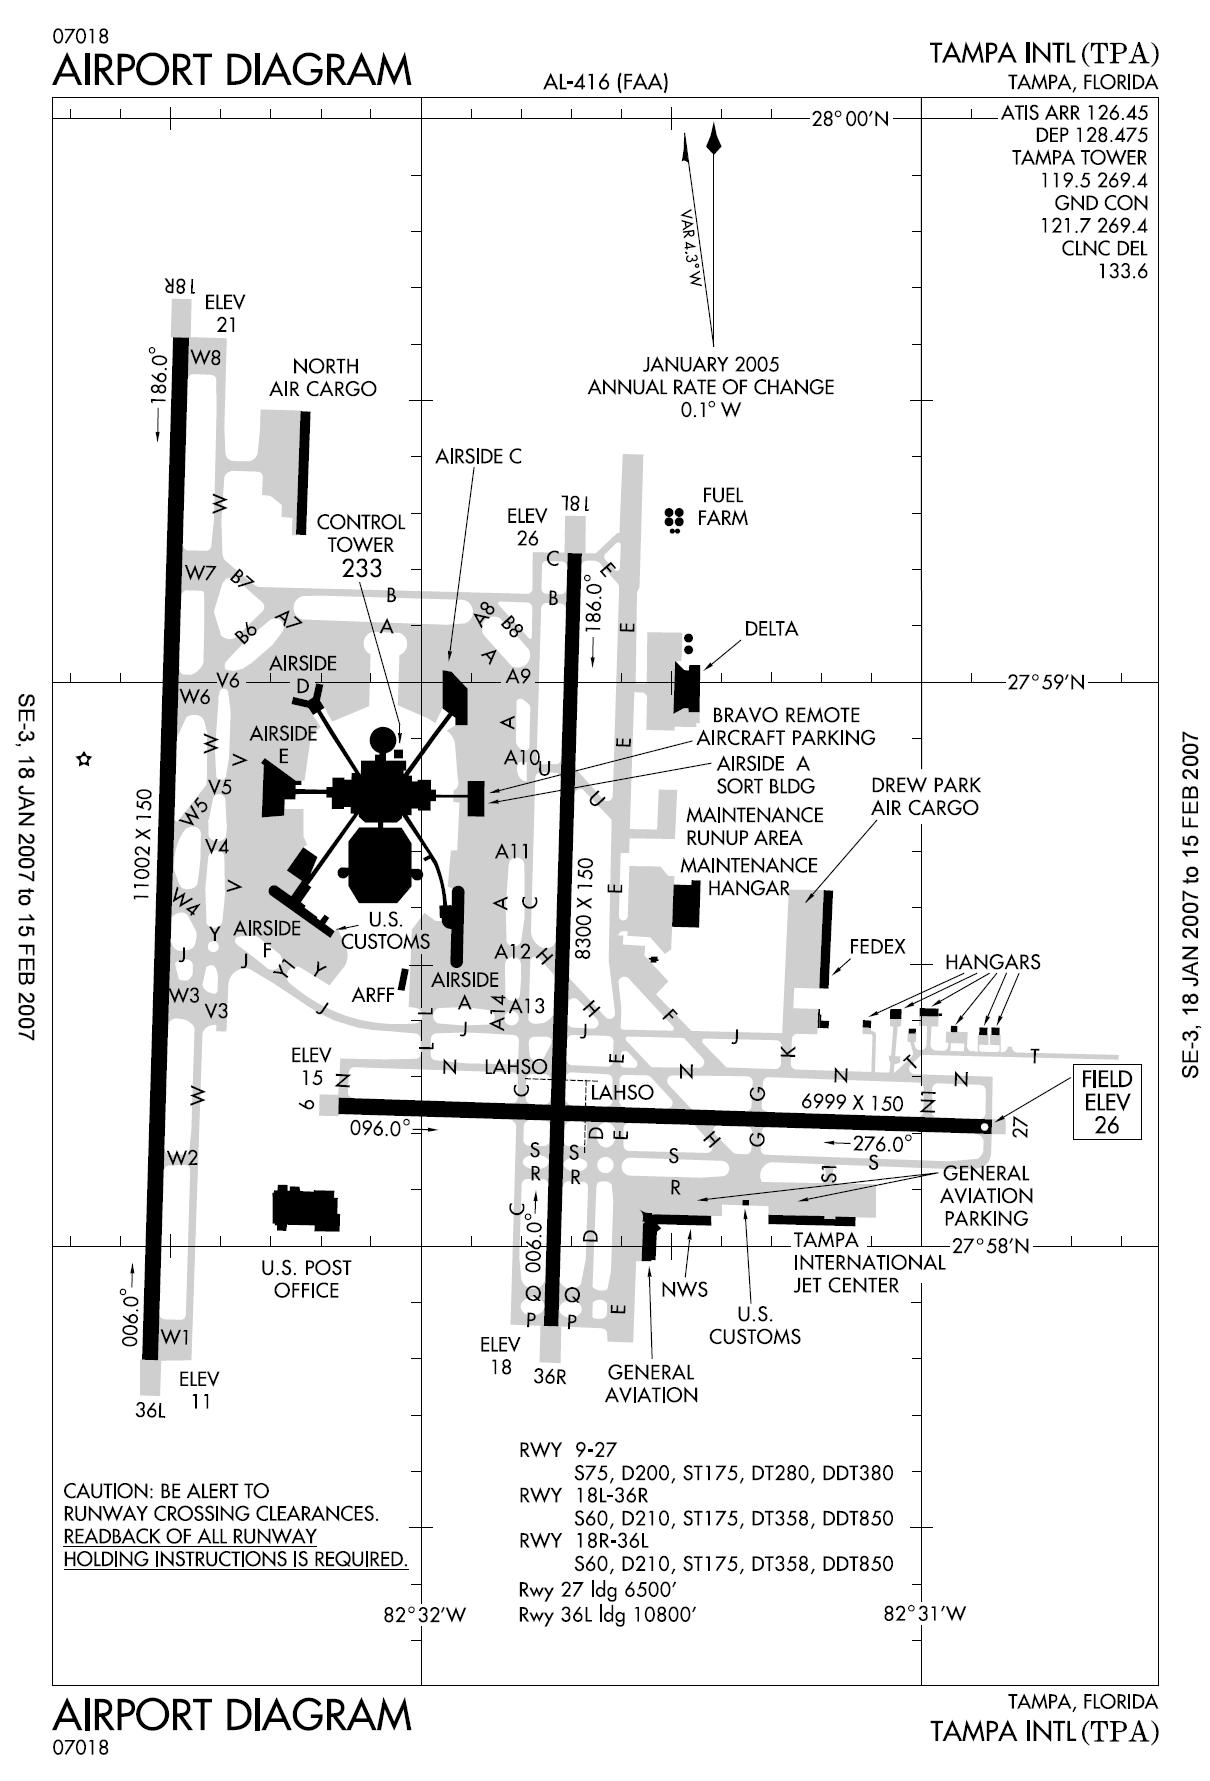 Tpa Tampa International Airport